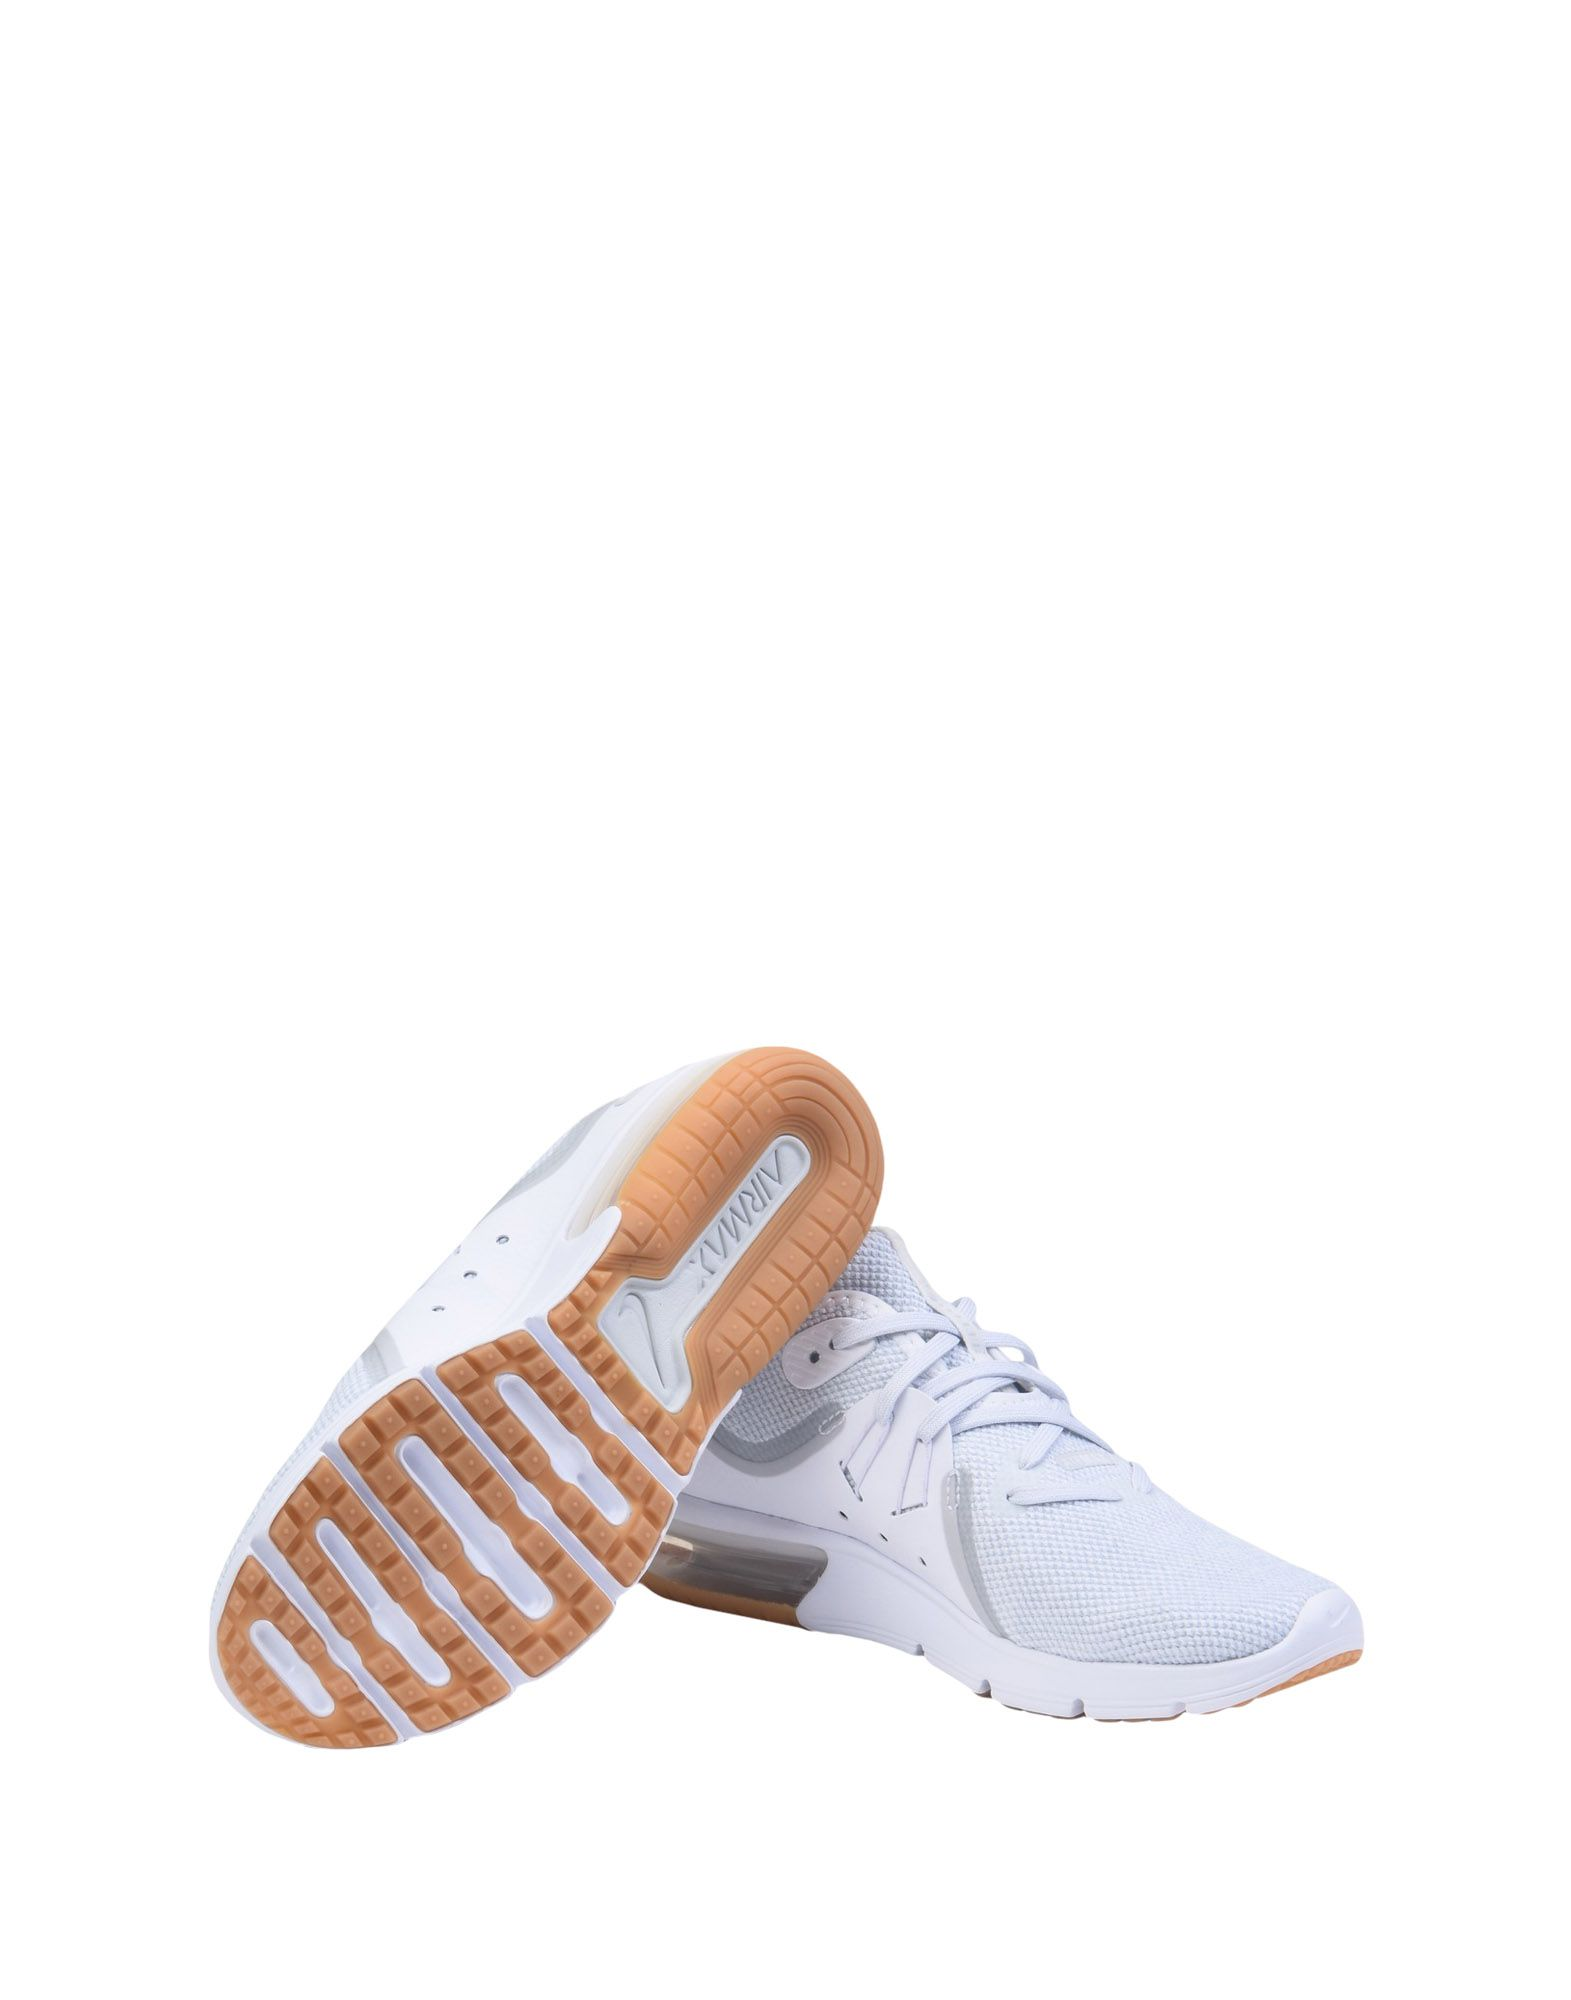 Nike Air Max Sequent 3  11511132BP Gute Qualität beliebte Schuhe